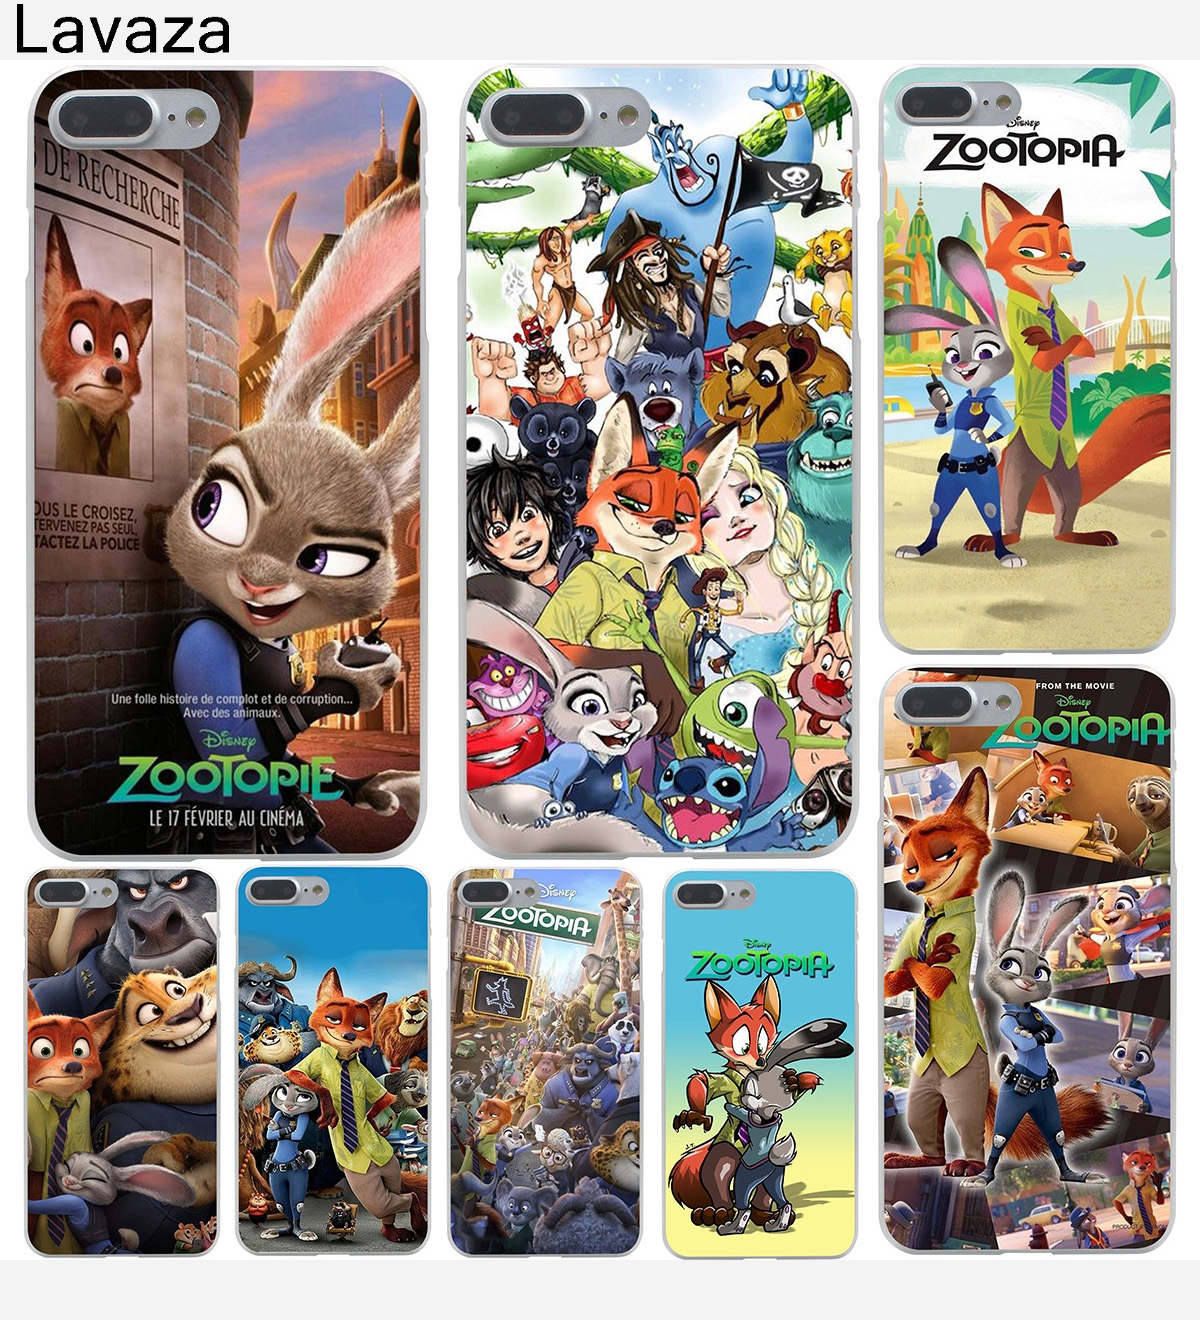 Lavaza Despicable Zootopia Hard Phone Case For Apple Iphone X 10 Dus 6 Plus Fullset Acc 7 6s 8 5 5s Se 5c 4 4s Coque Shell Cover